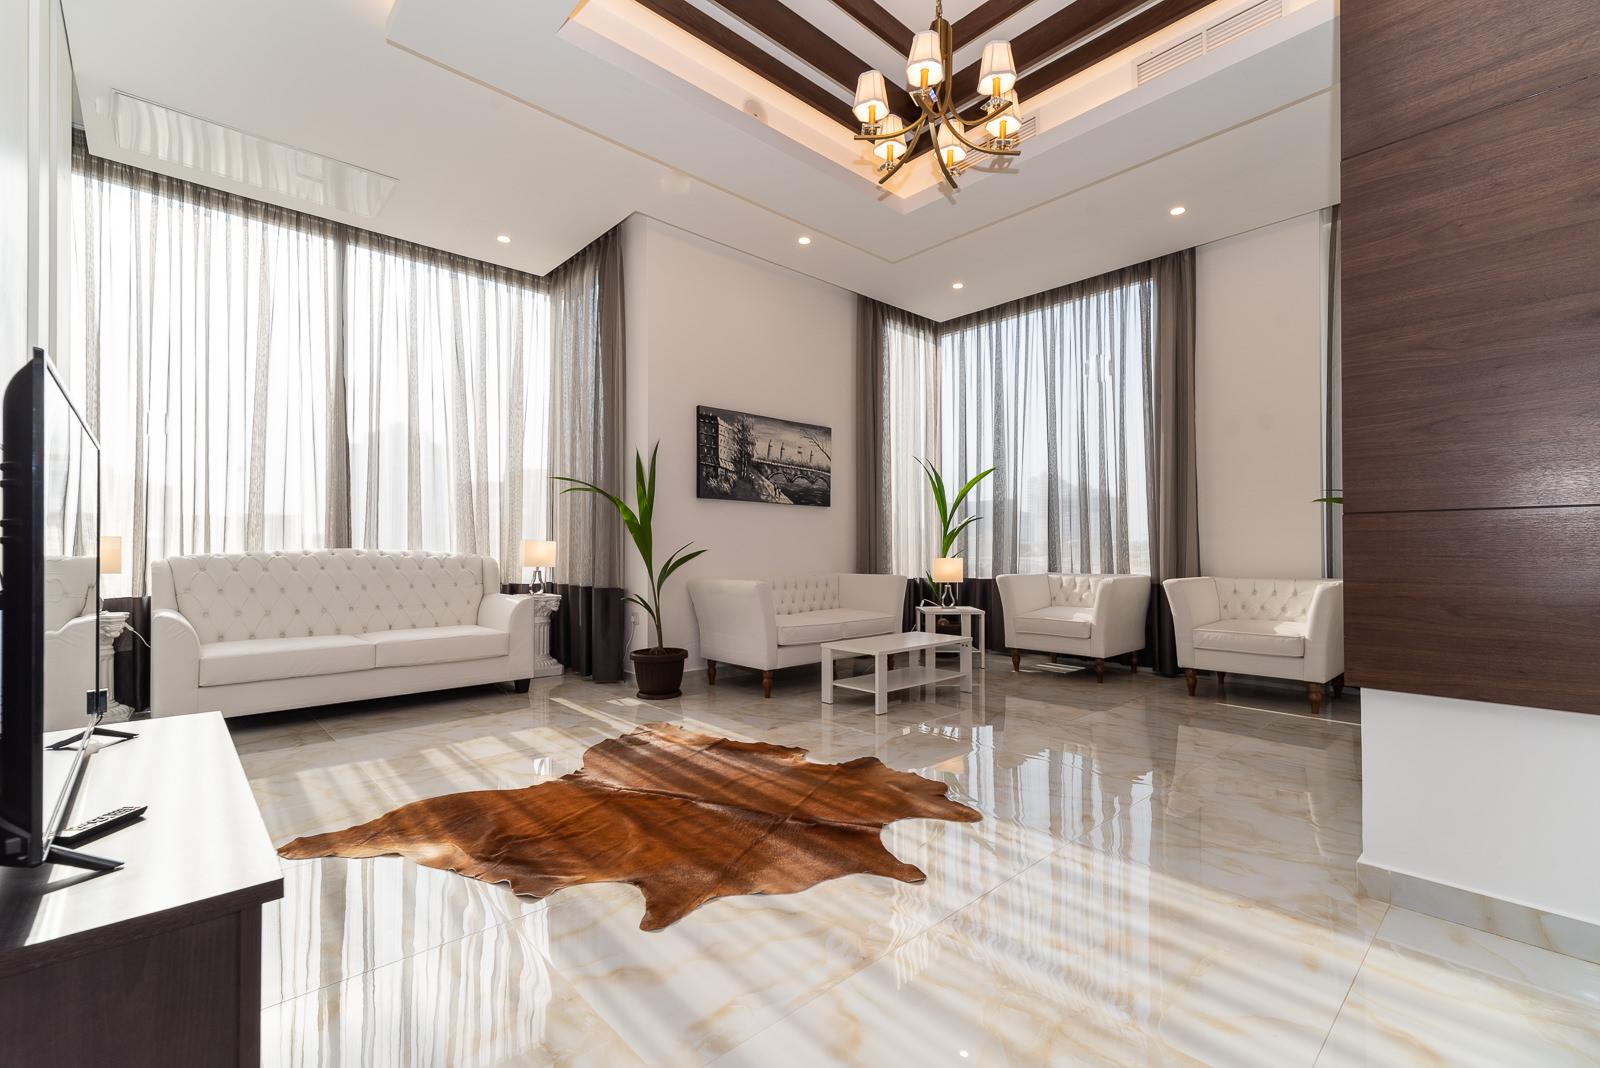 Sabah Al Salem – brand new, two bedroom apartments